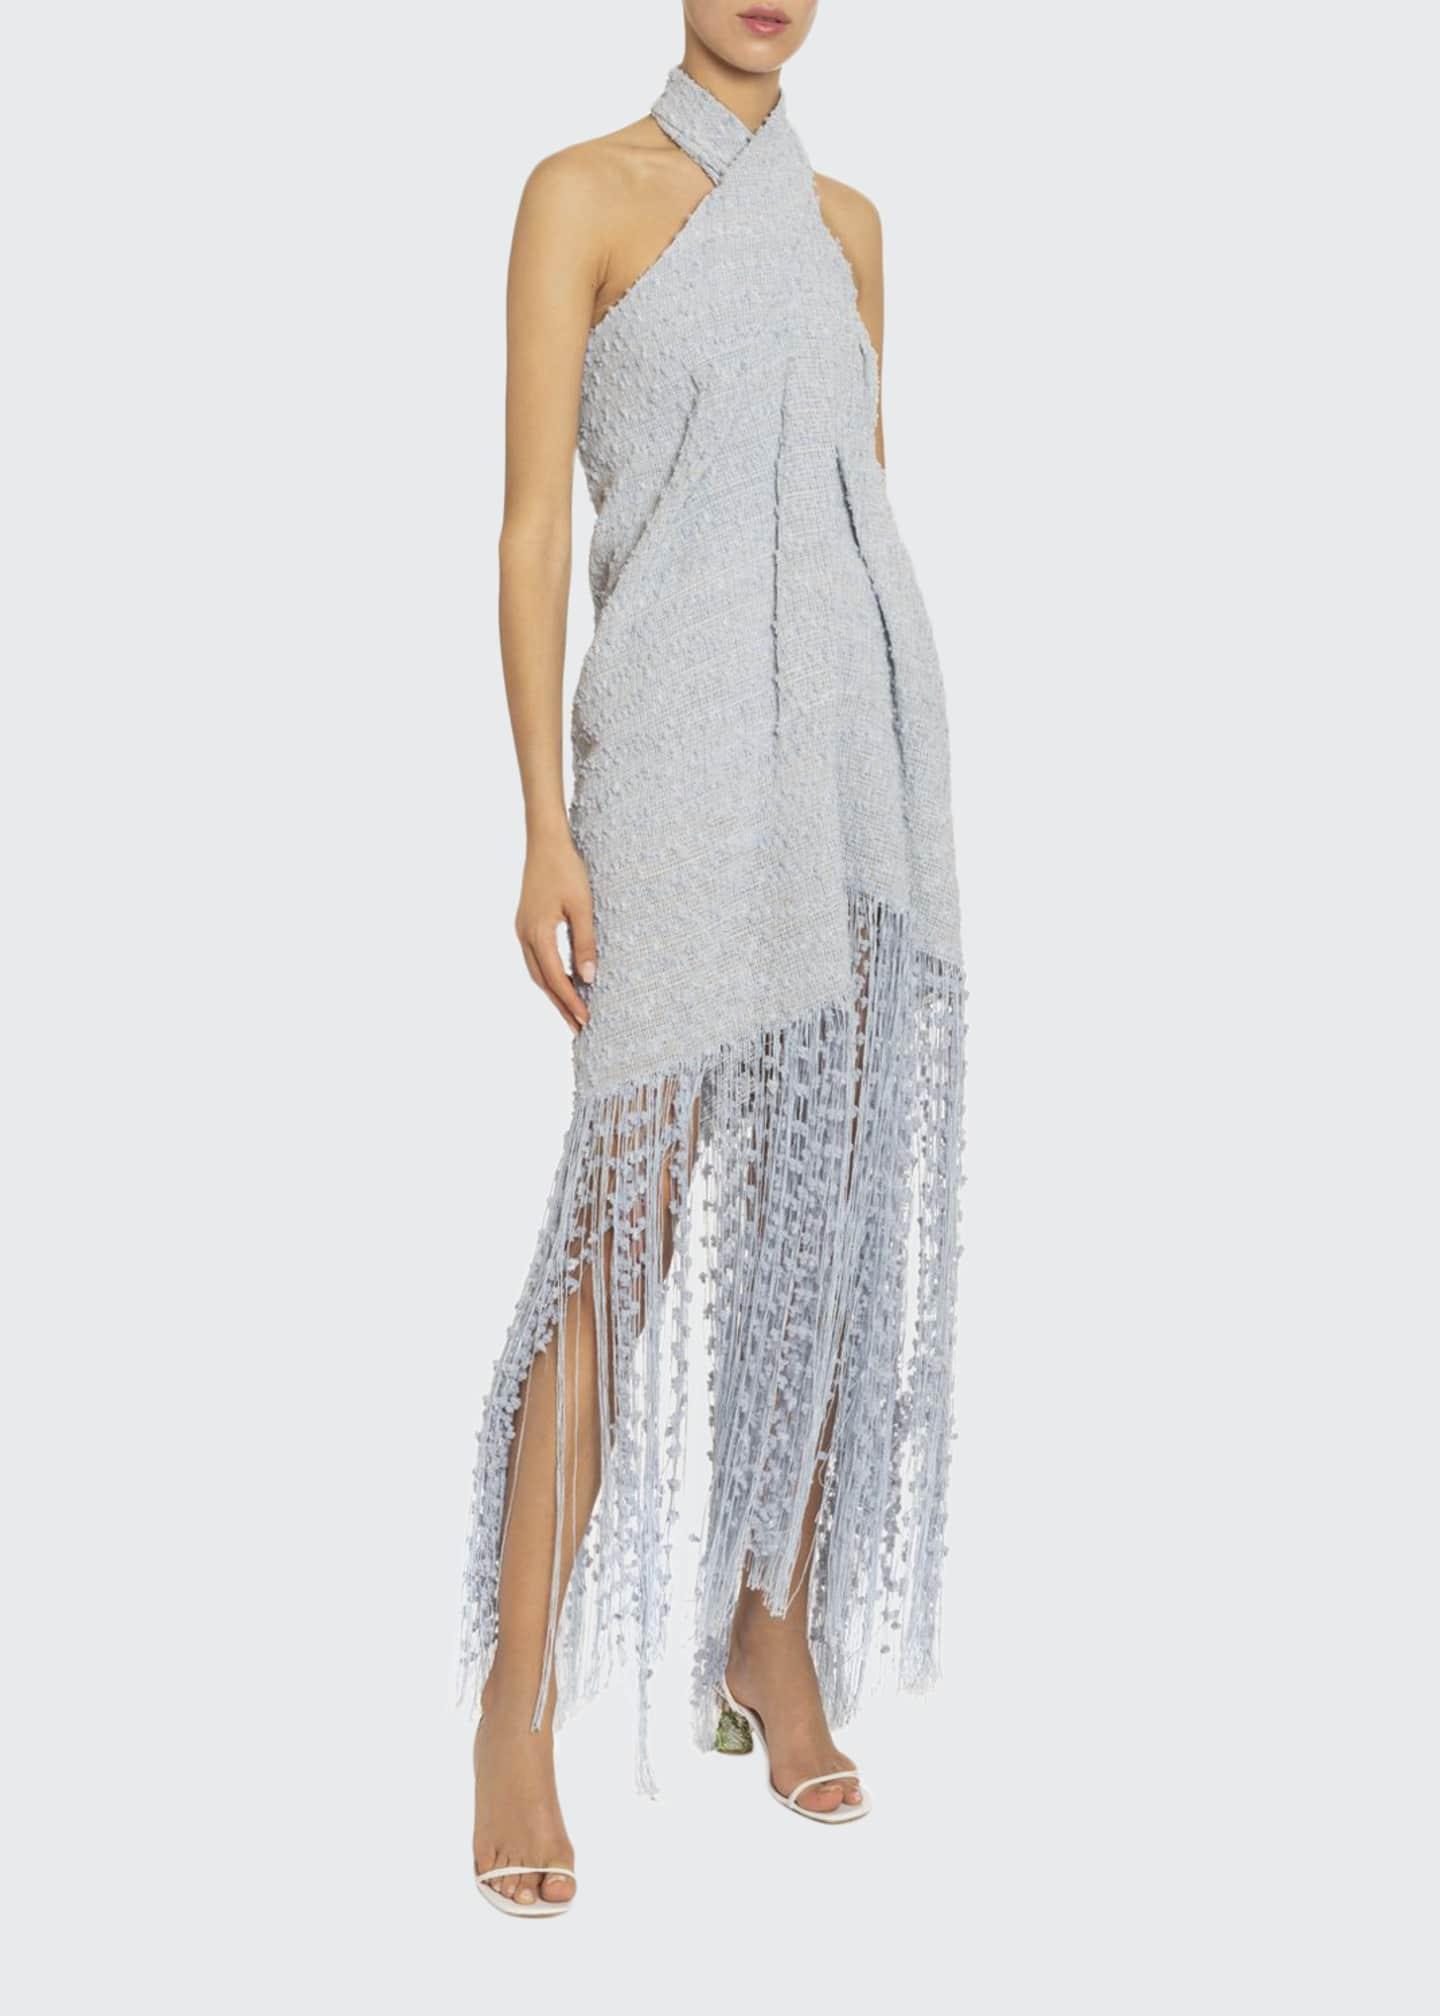 Jacquemus La Cortese Textured Halter-Neck Dress